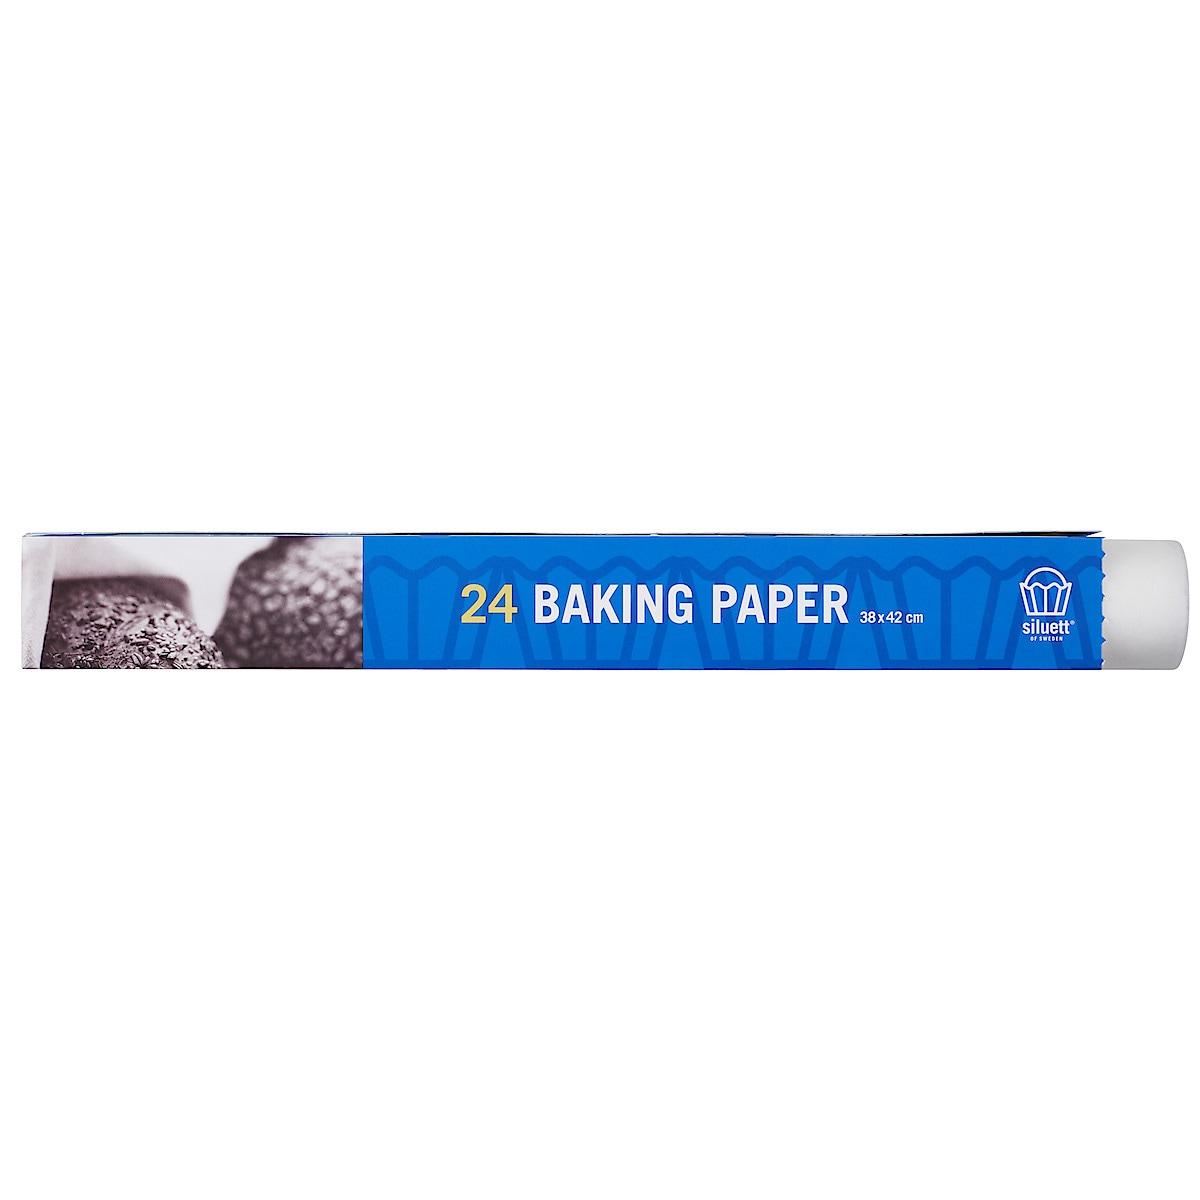 Bakepapir